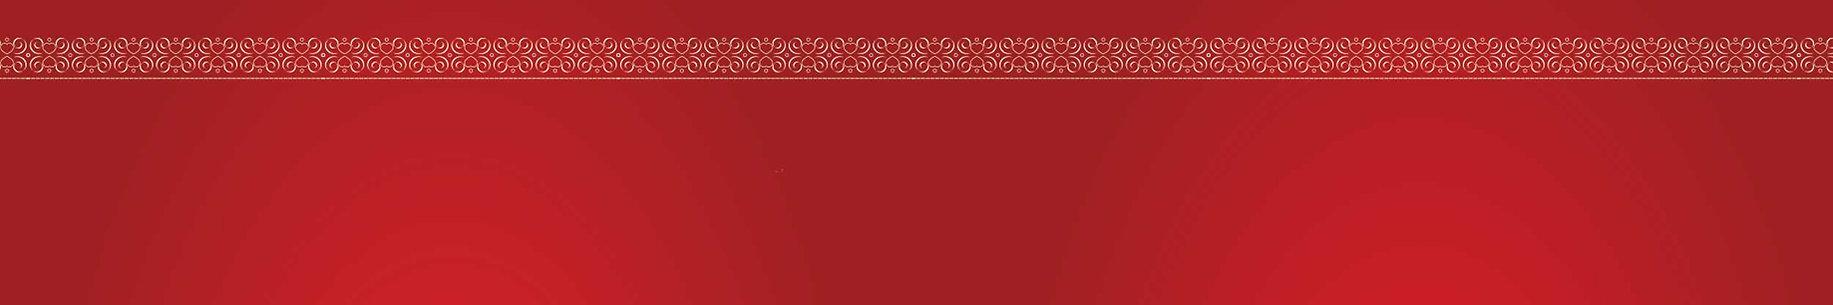 Red_strip_short.jpg